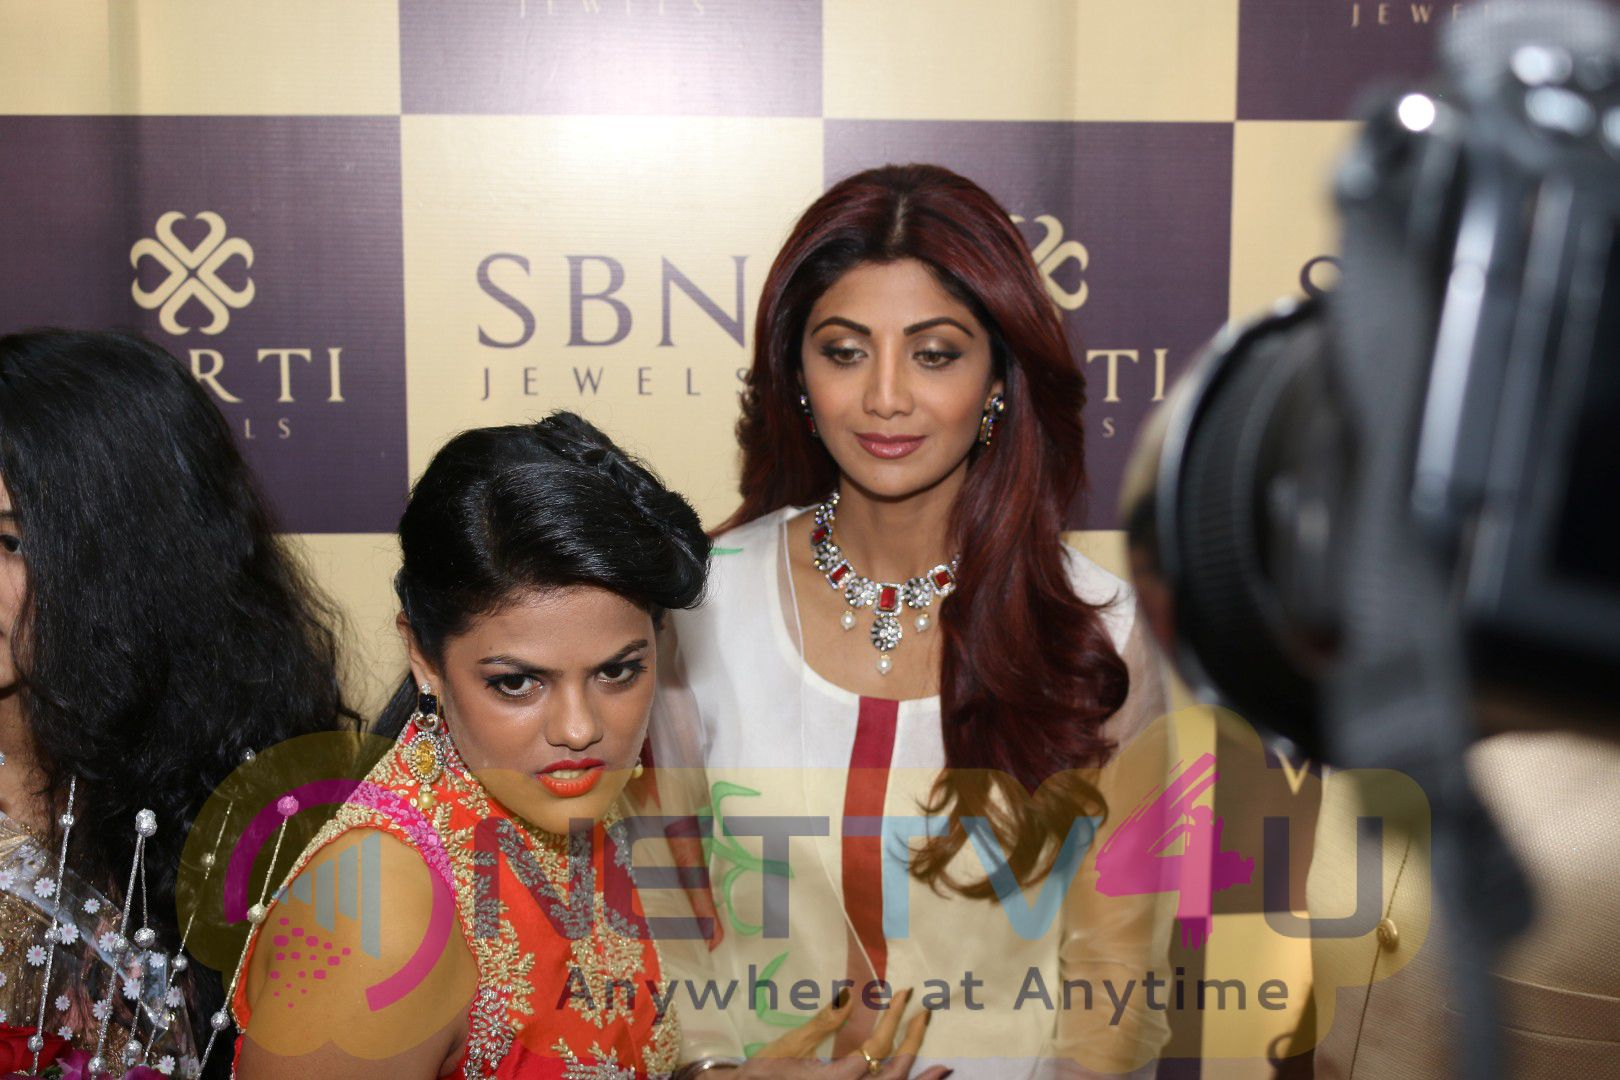 Shilpa Shetty Kundra At Inauguration Of Jewellery Show Room Fashionable Pics